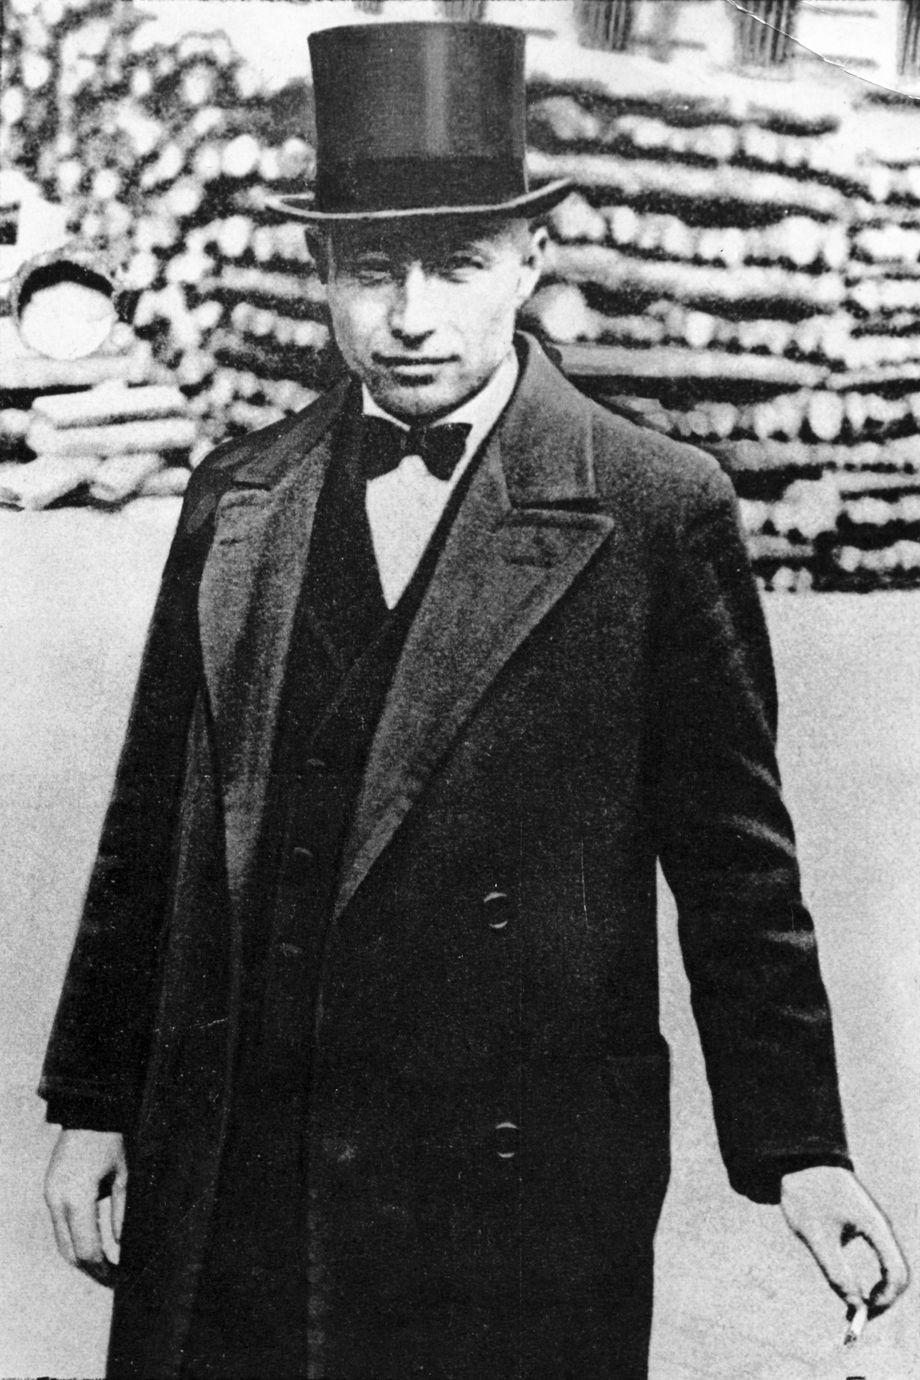 Johannes Reichhart